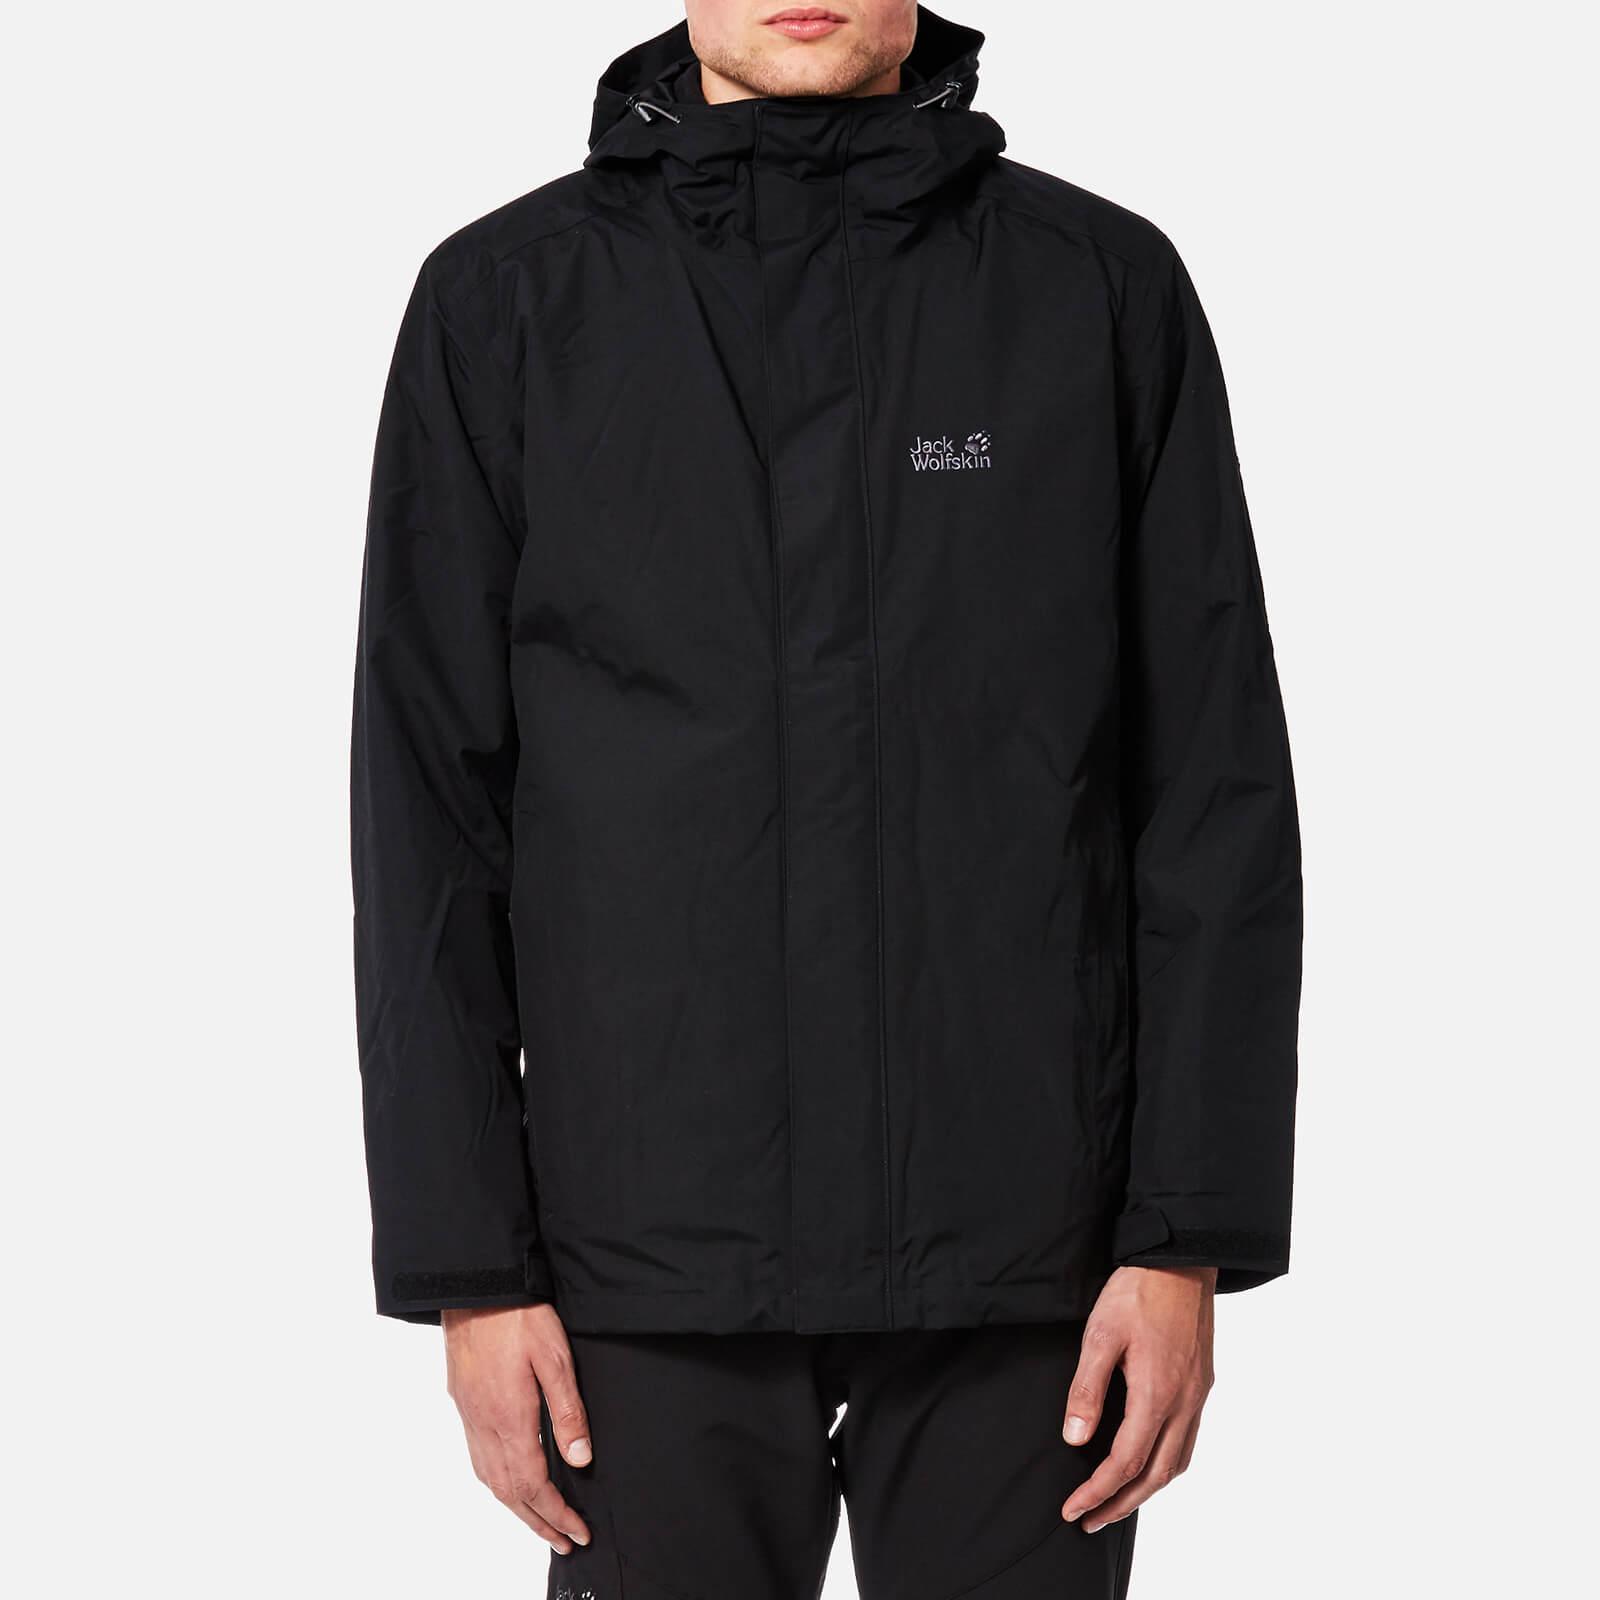 e6687a51d Jack Wolfskin Men's Iceland 3-in-1 Jacket - Black